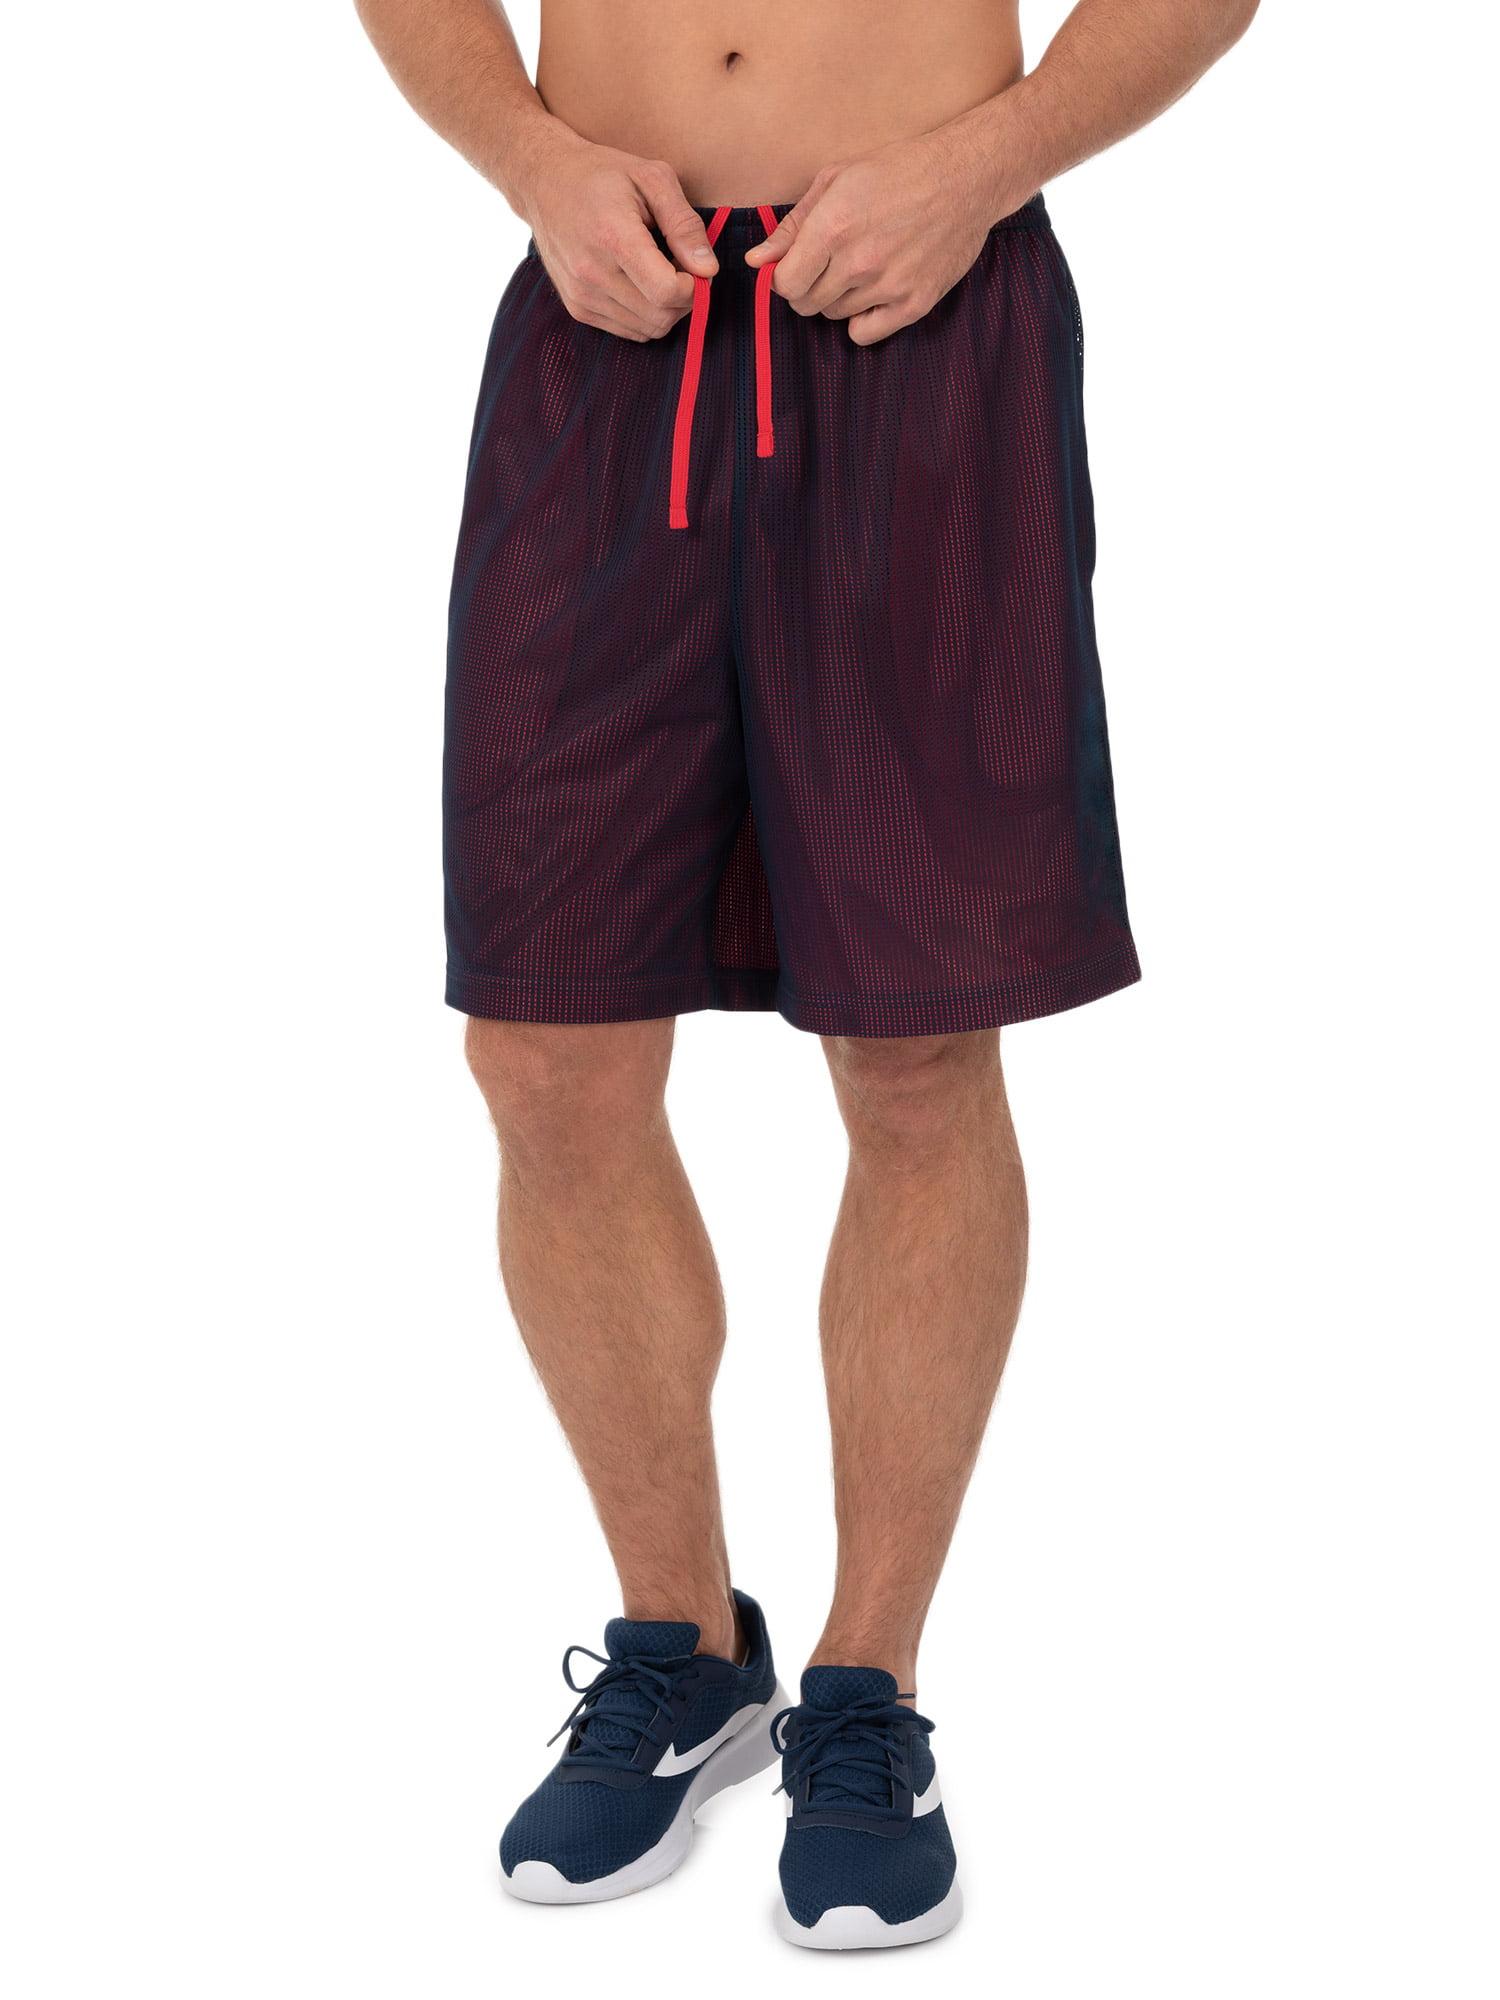 Men's Bigs Athletic Works Active Performance Grid Mesh Short